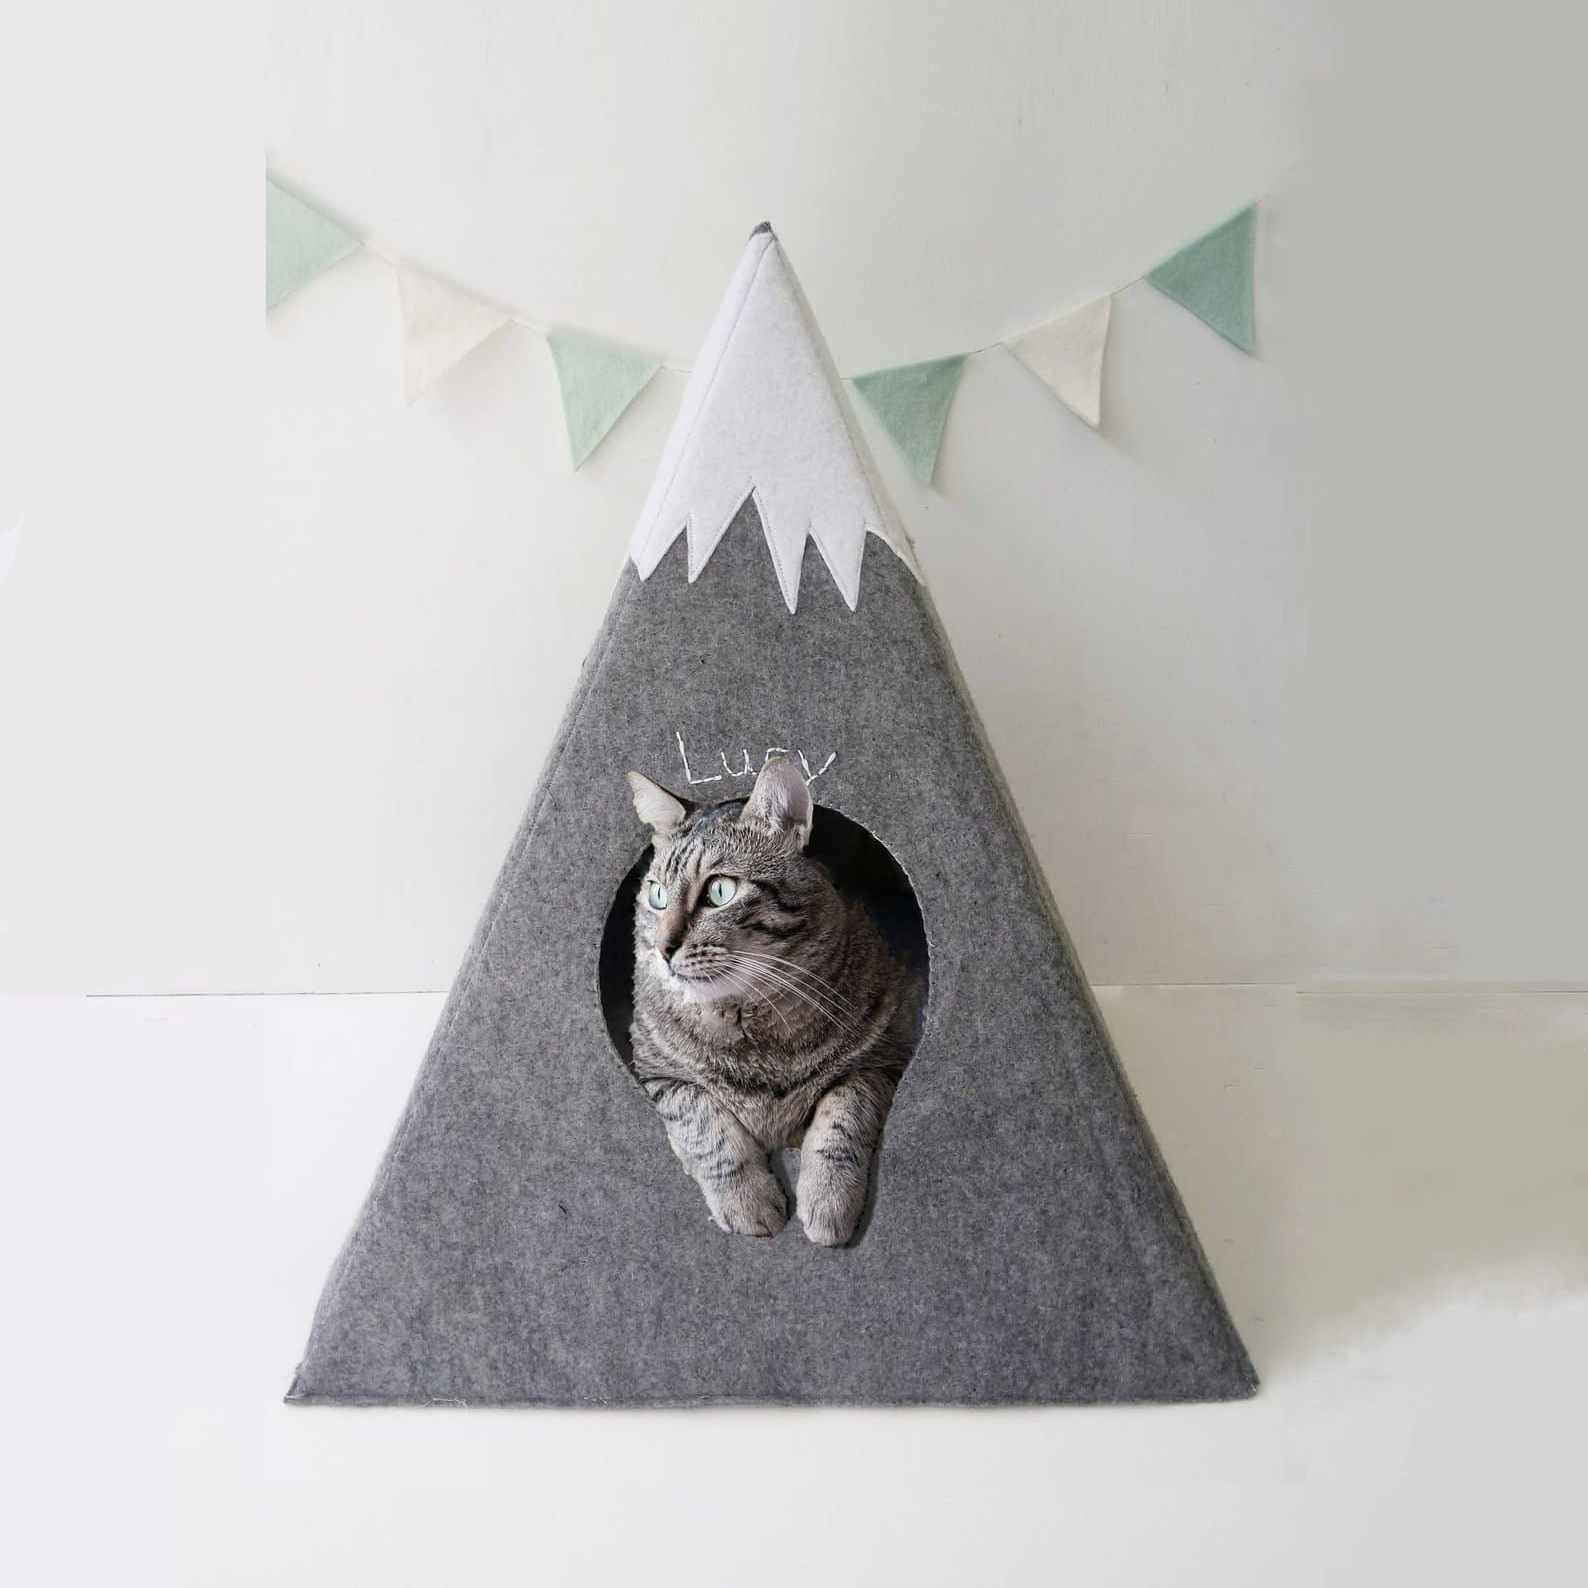 niche chat pyramide